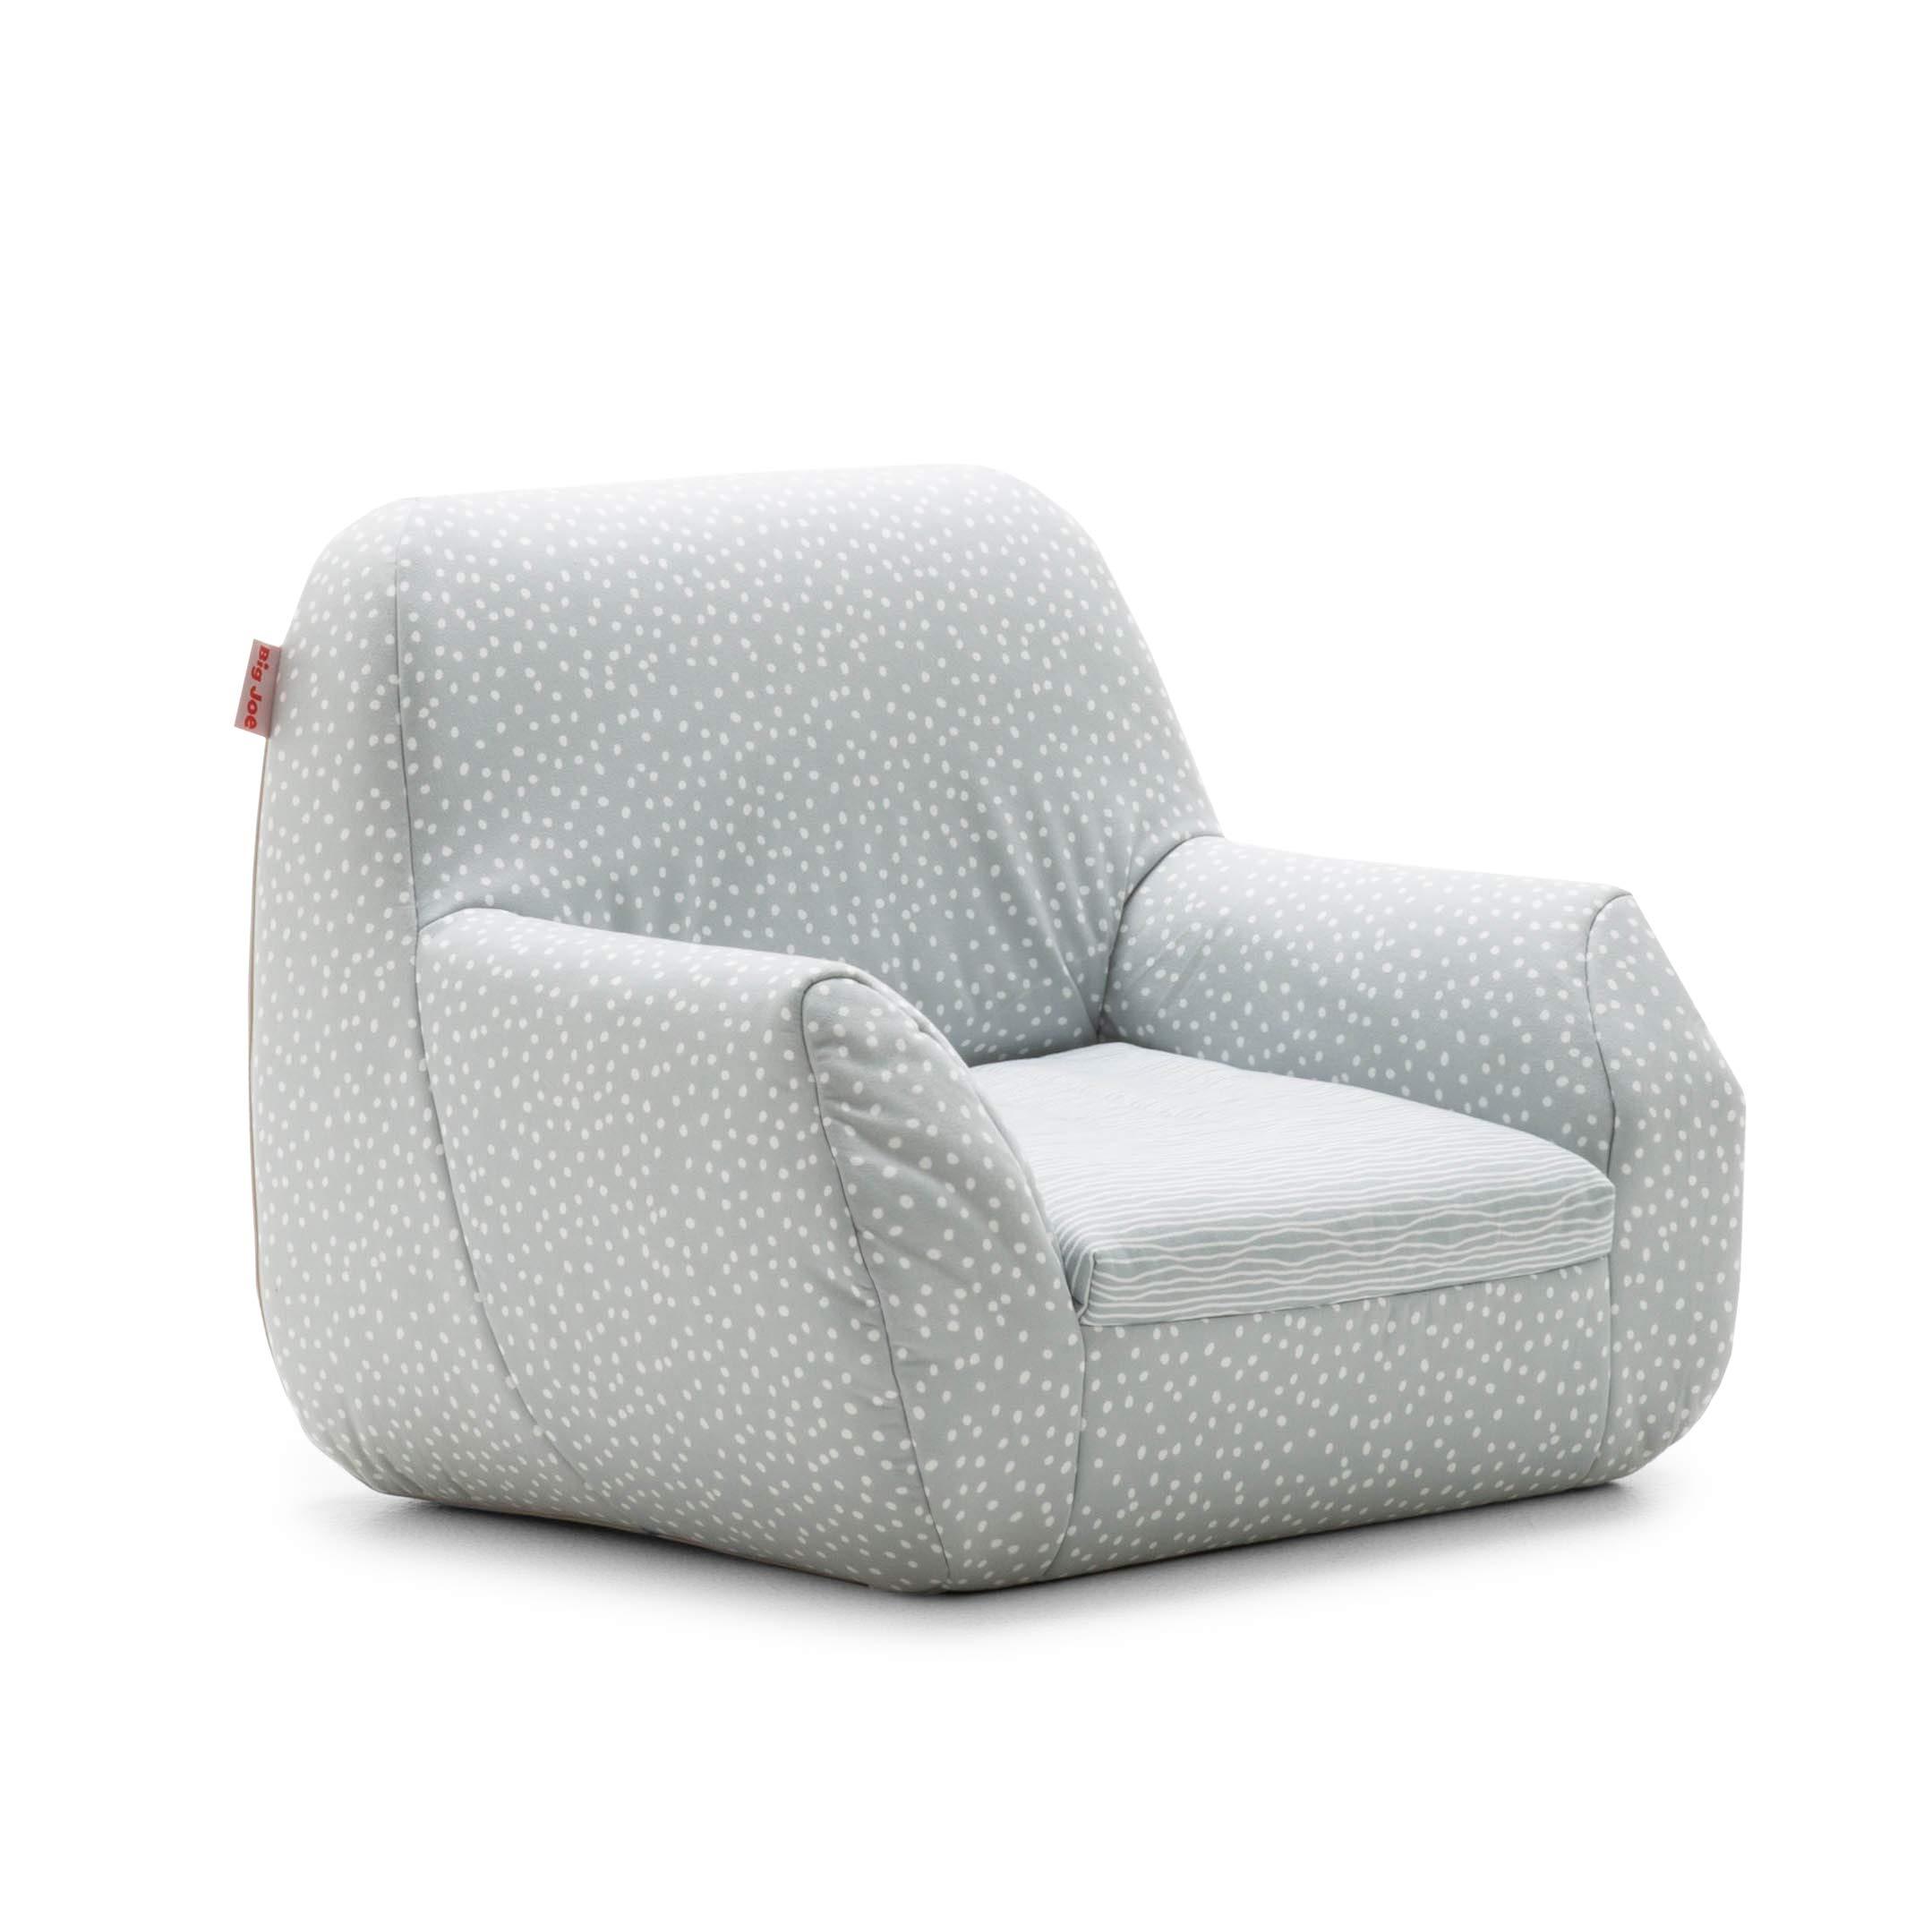 Big Joe 1596687 Mid Mod, Lenox Gray Stripes and Dots Kid's Chair,